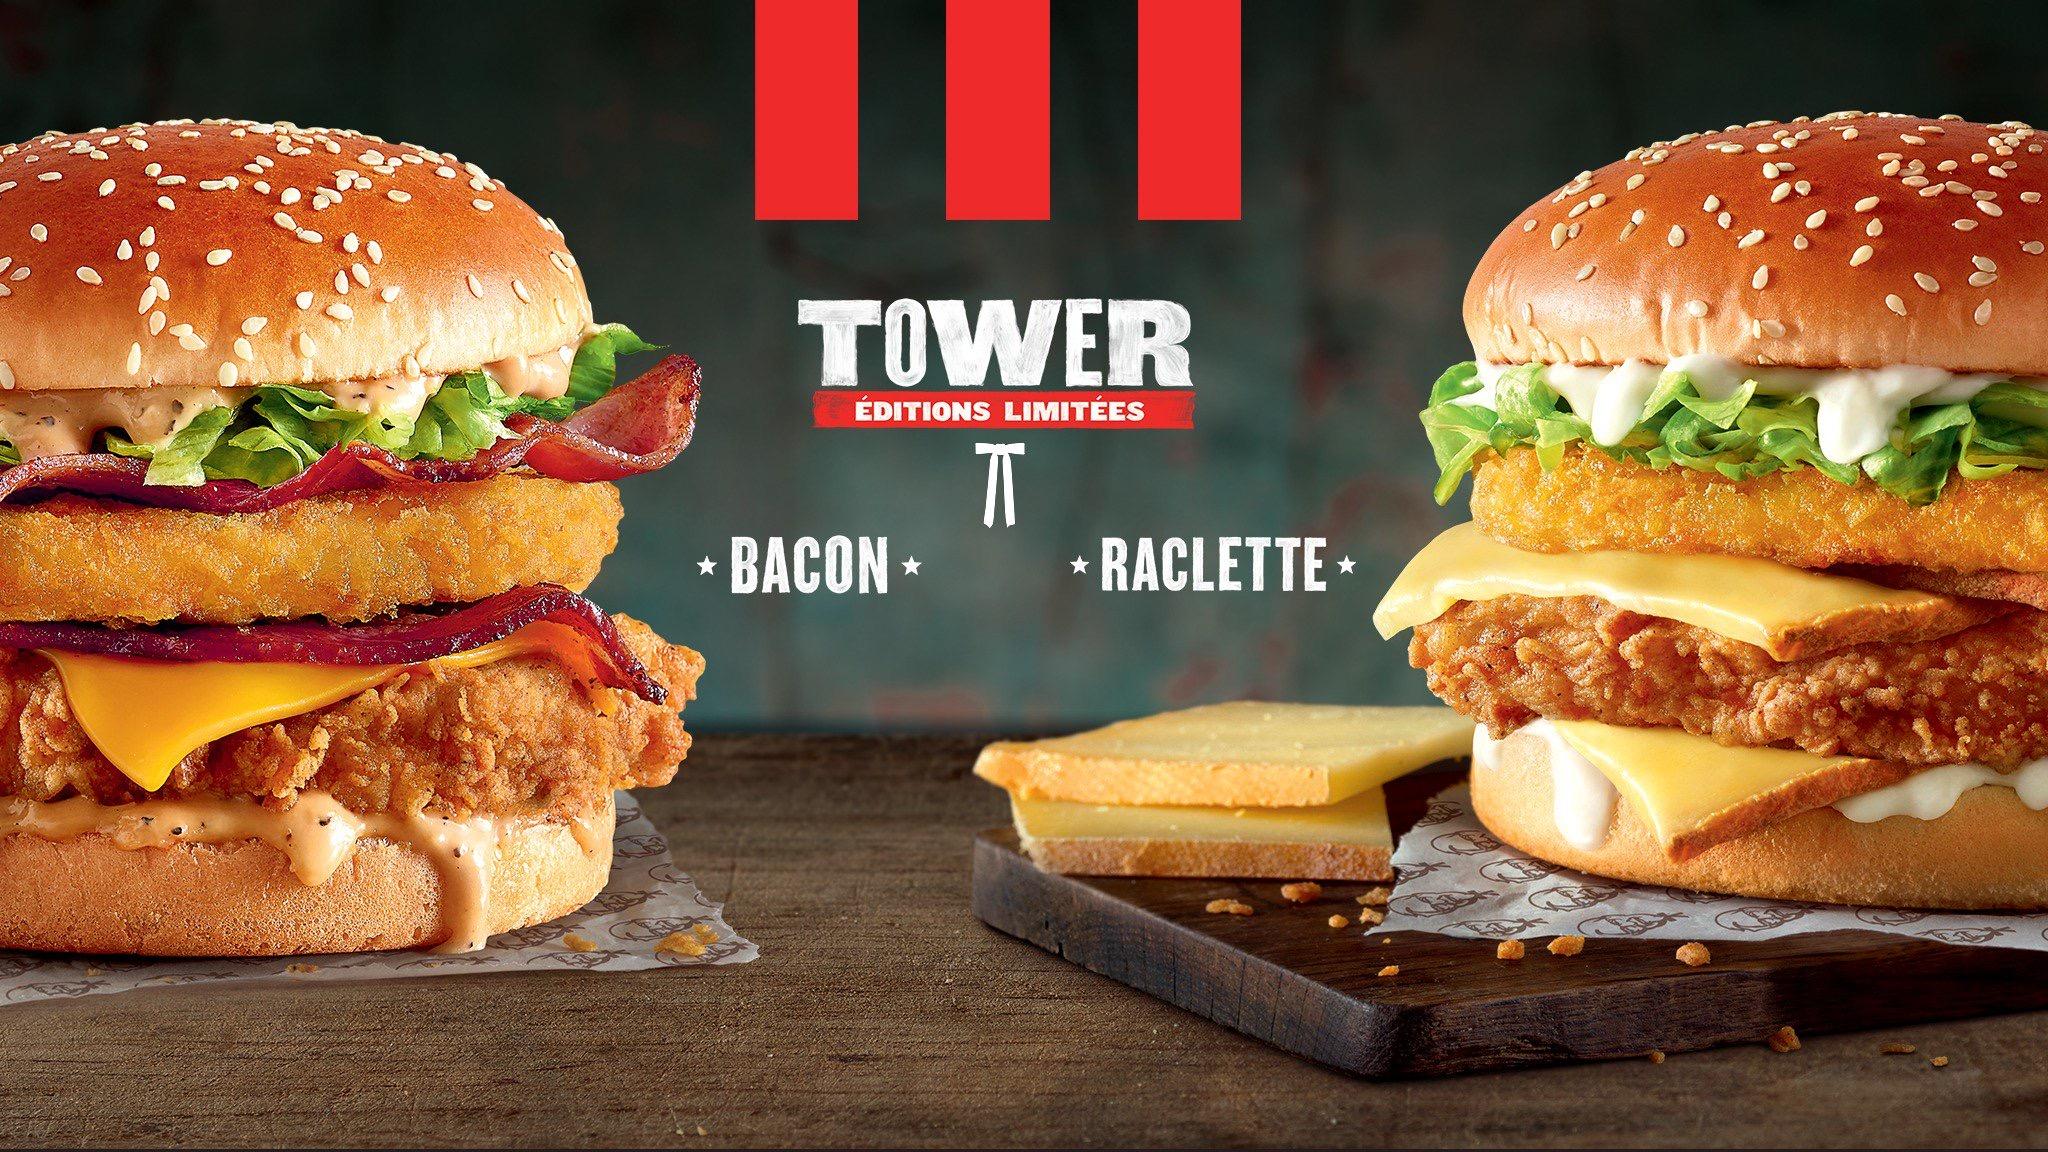 KFC France - Raclette Tower Burger